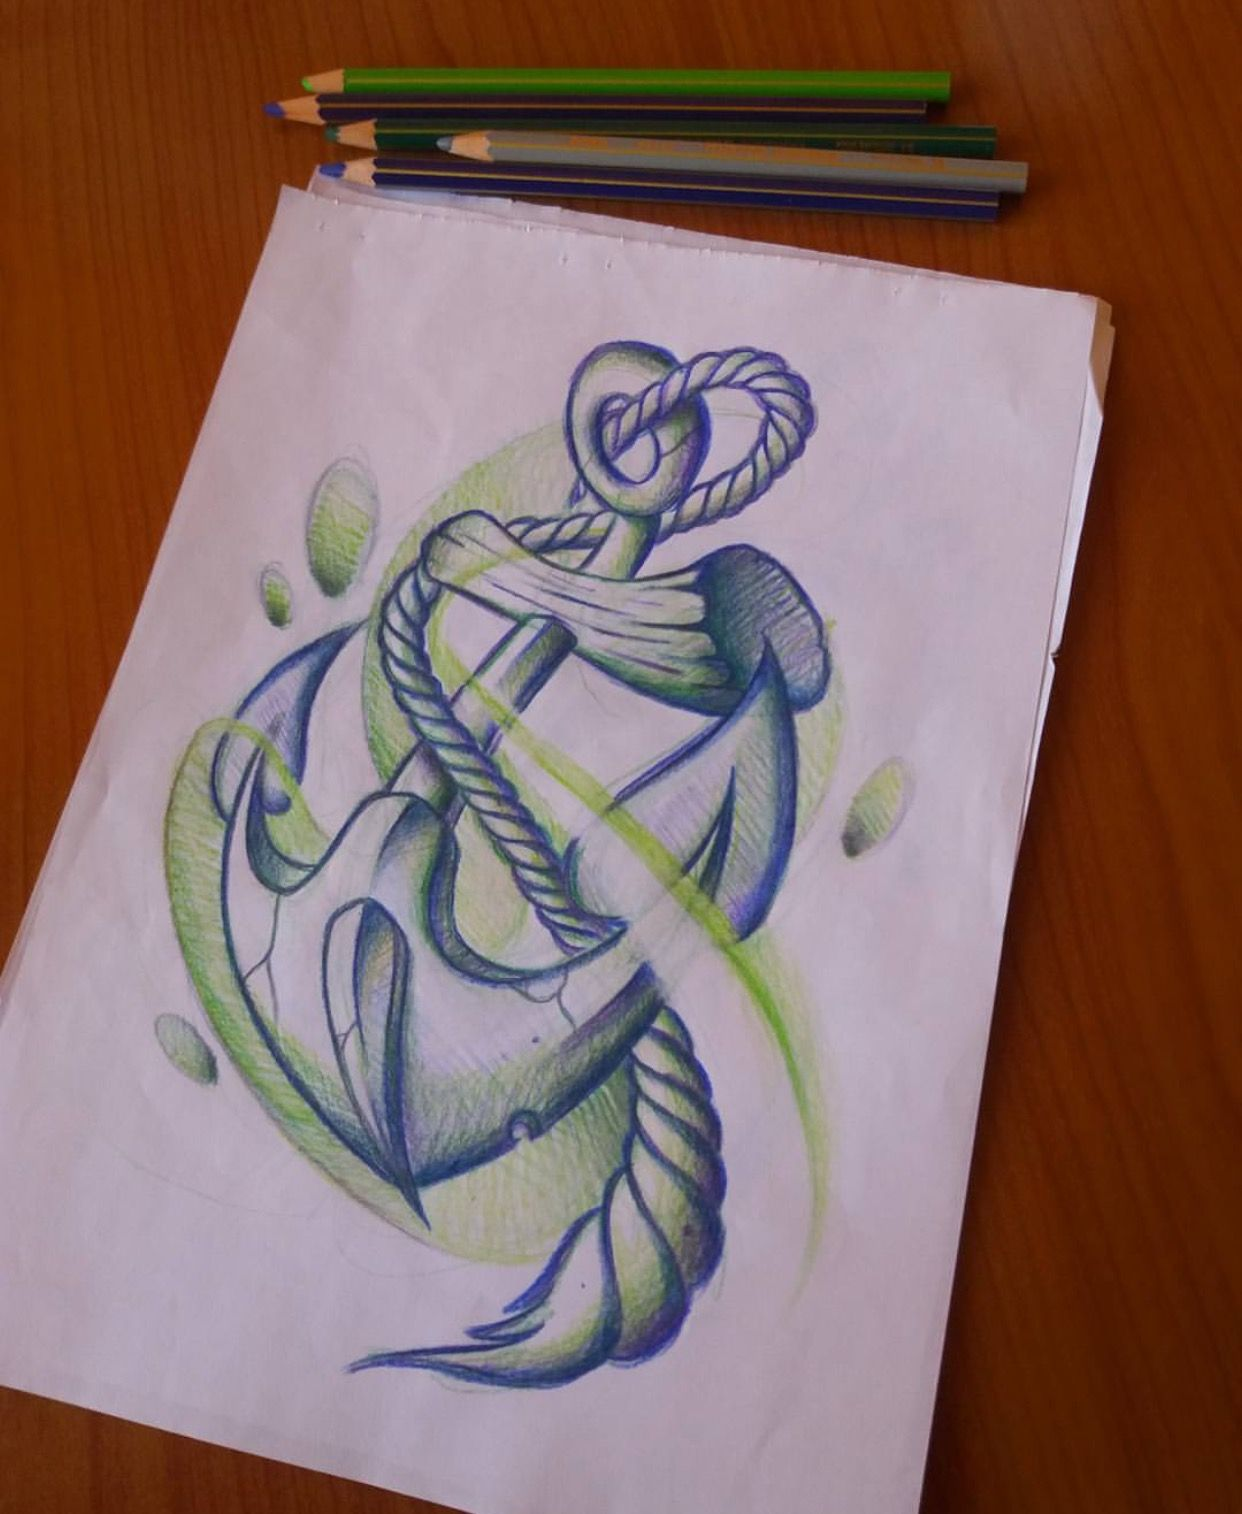 Bocetos De Tatuajes Tradicionales pin de rogers en wou | bocetos tatuajes, dibujos a lápiz